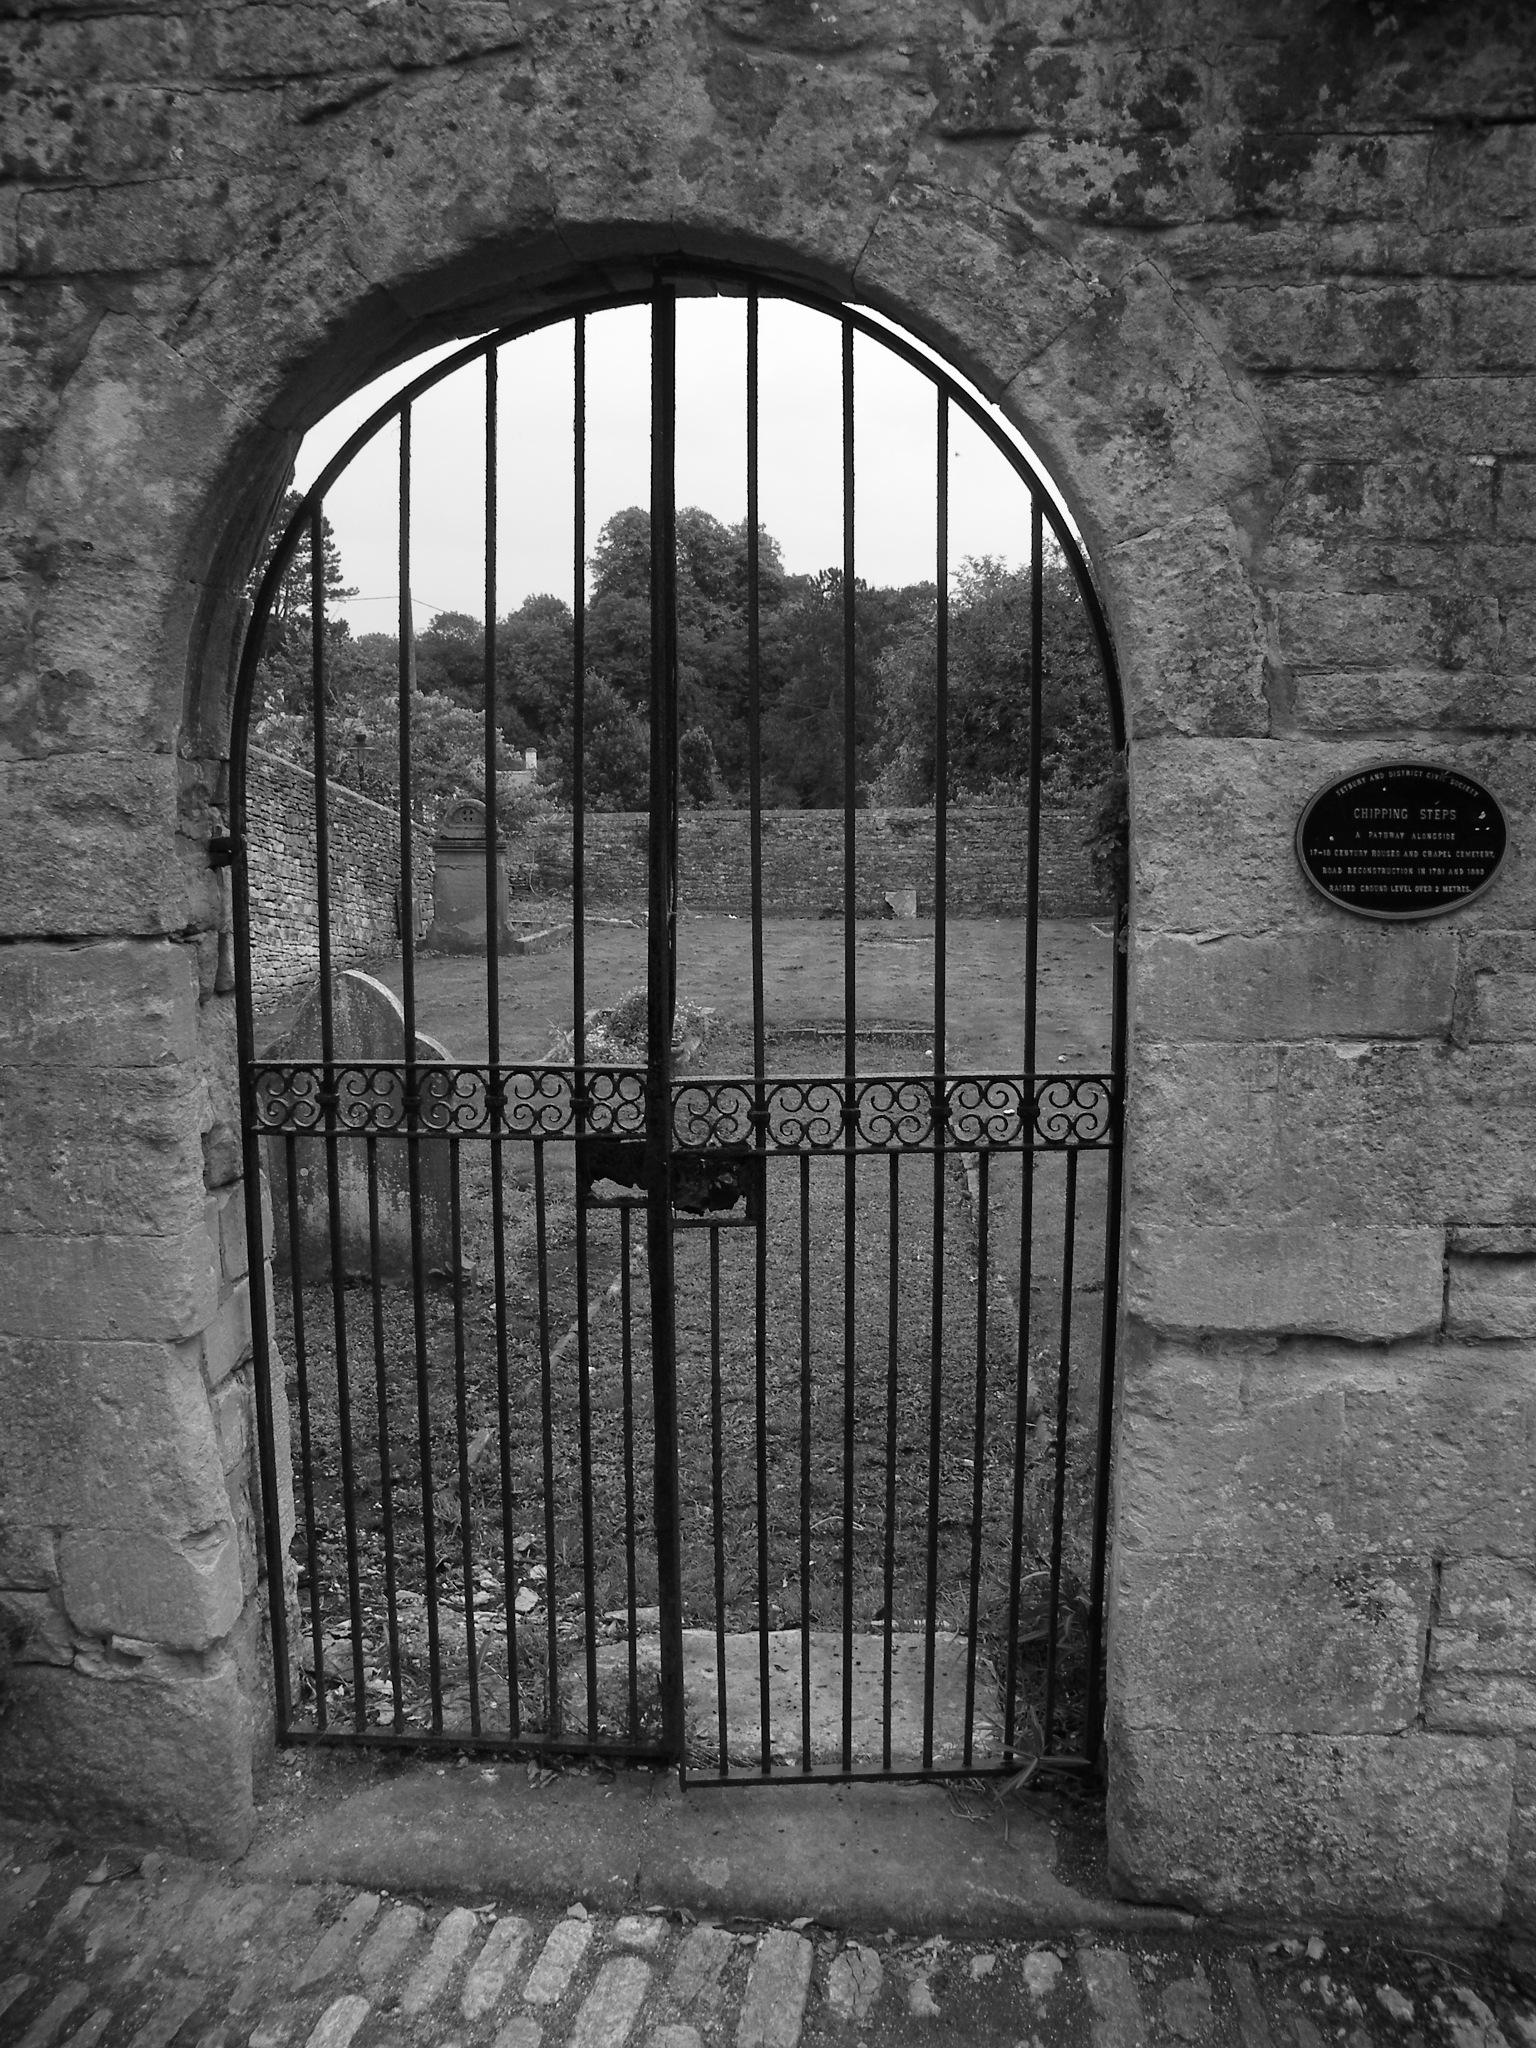 gates of heaven by Chris Algar